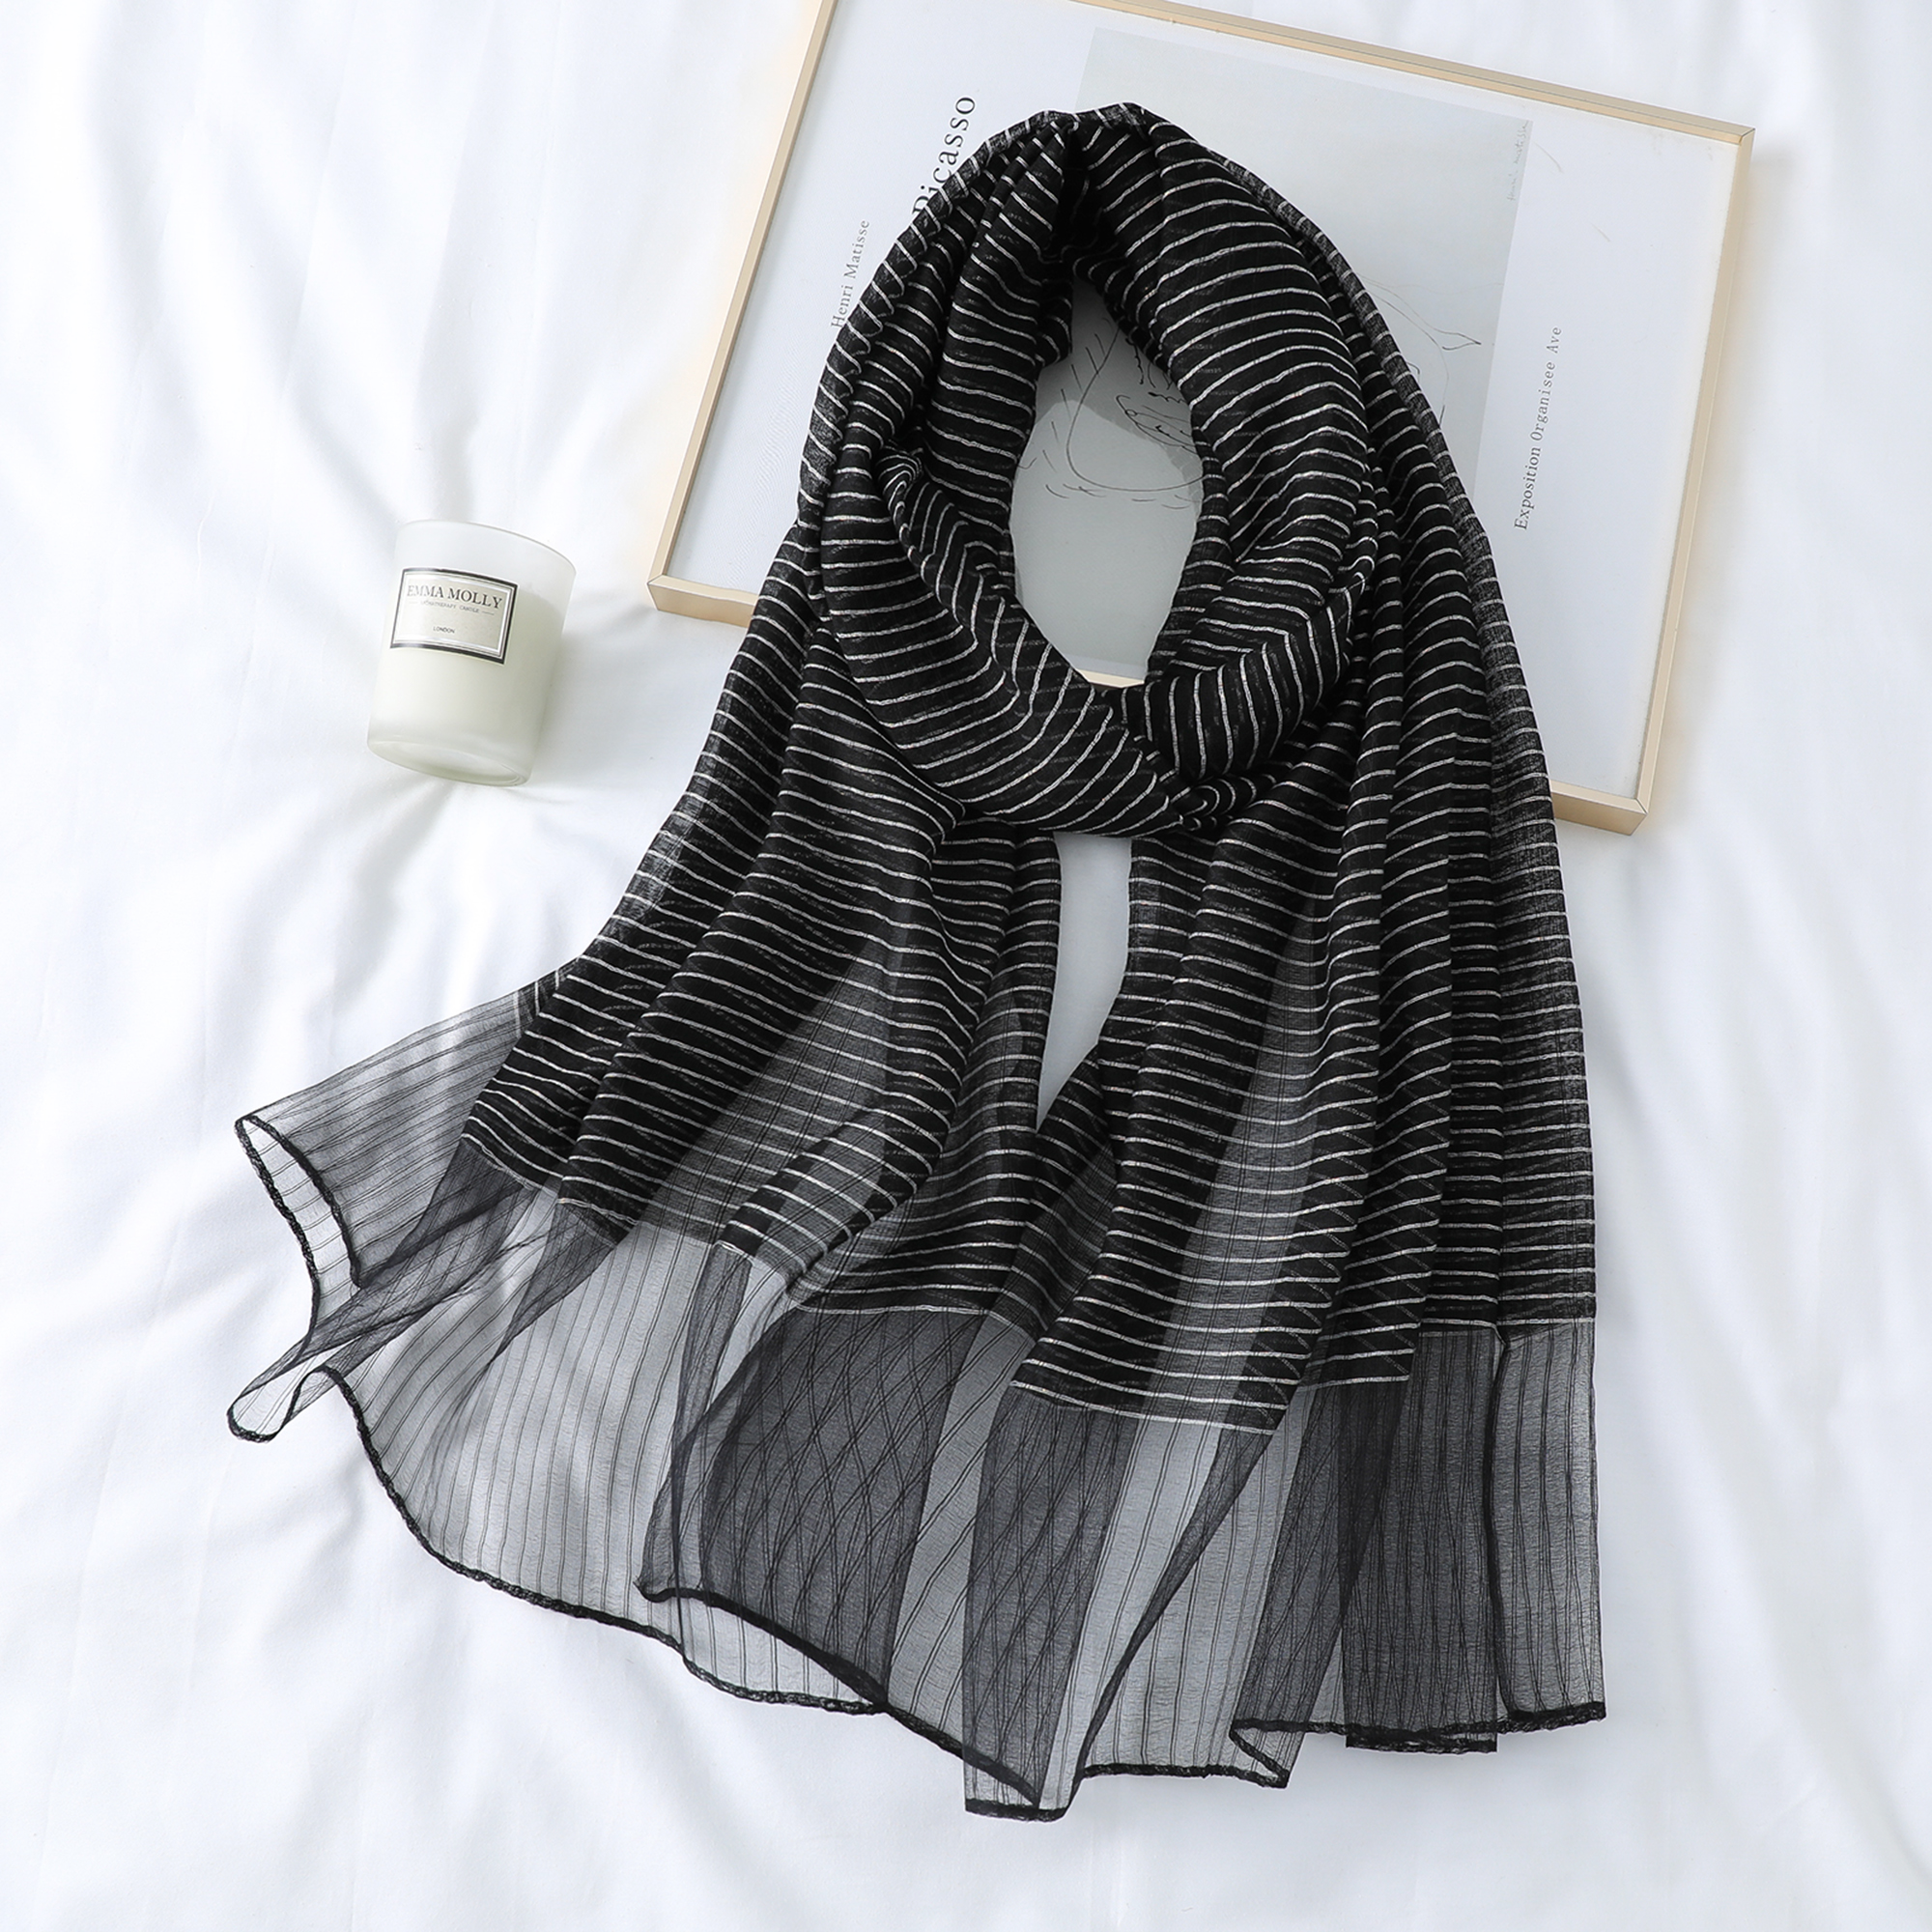 Spring Autumn Silk Scarf Women Soft Shawls Fashion Bandana Ladies Shawl  Female Rectangle Pashmina Plaid Blanket